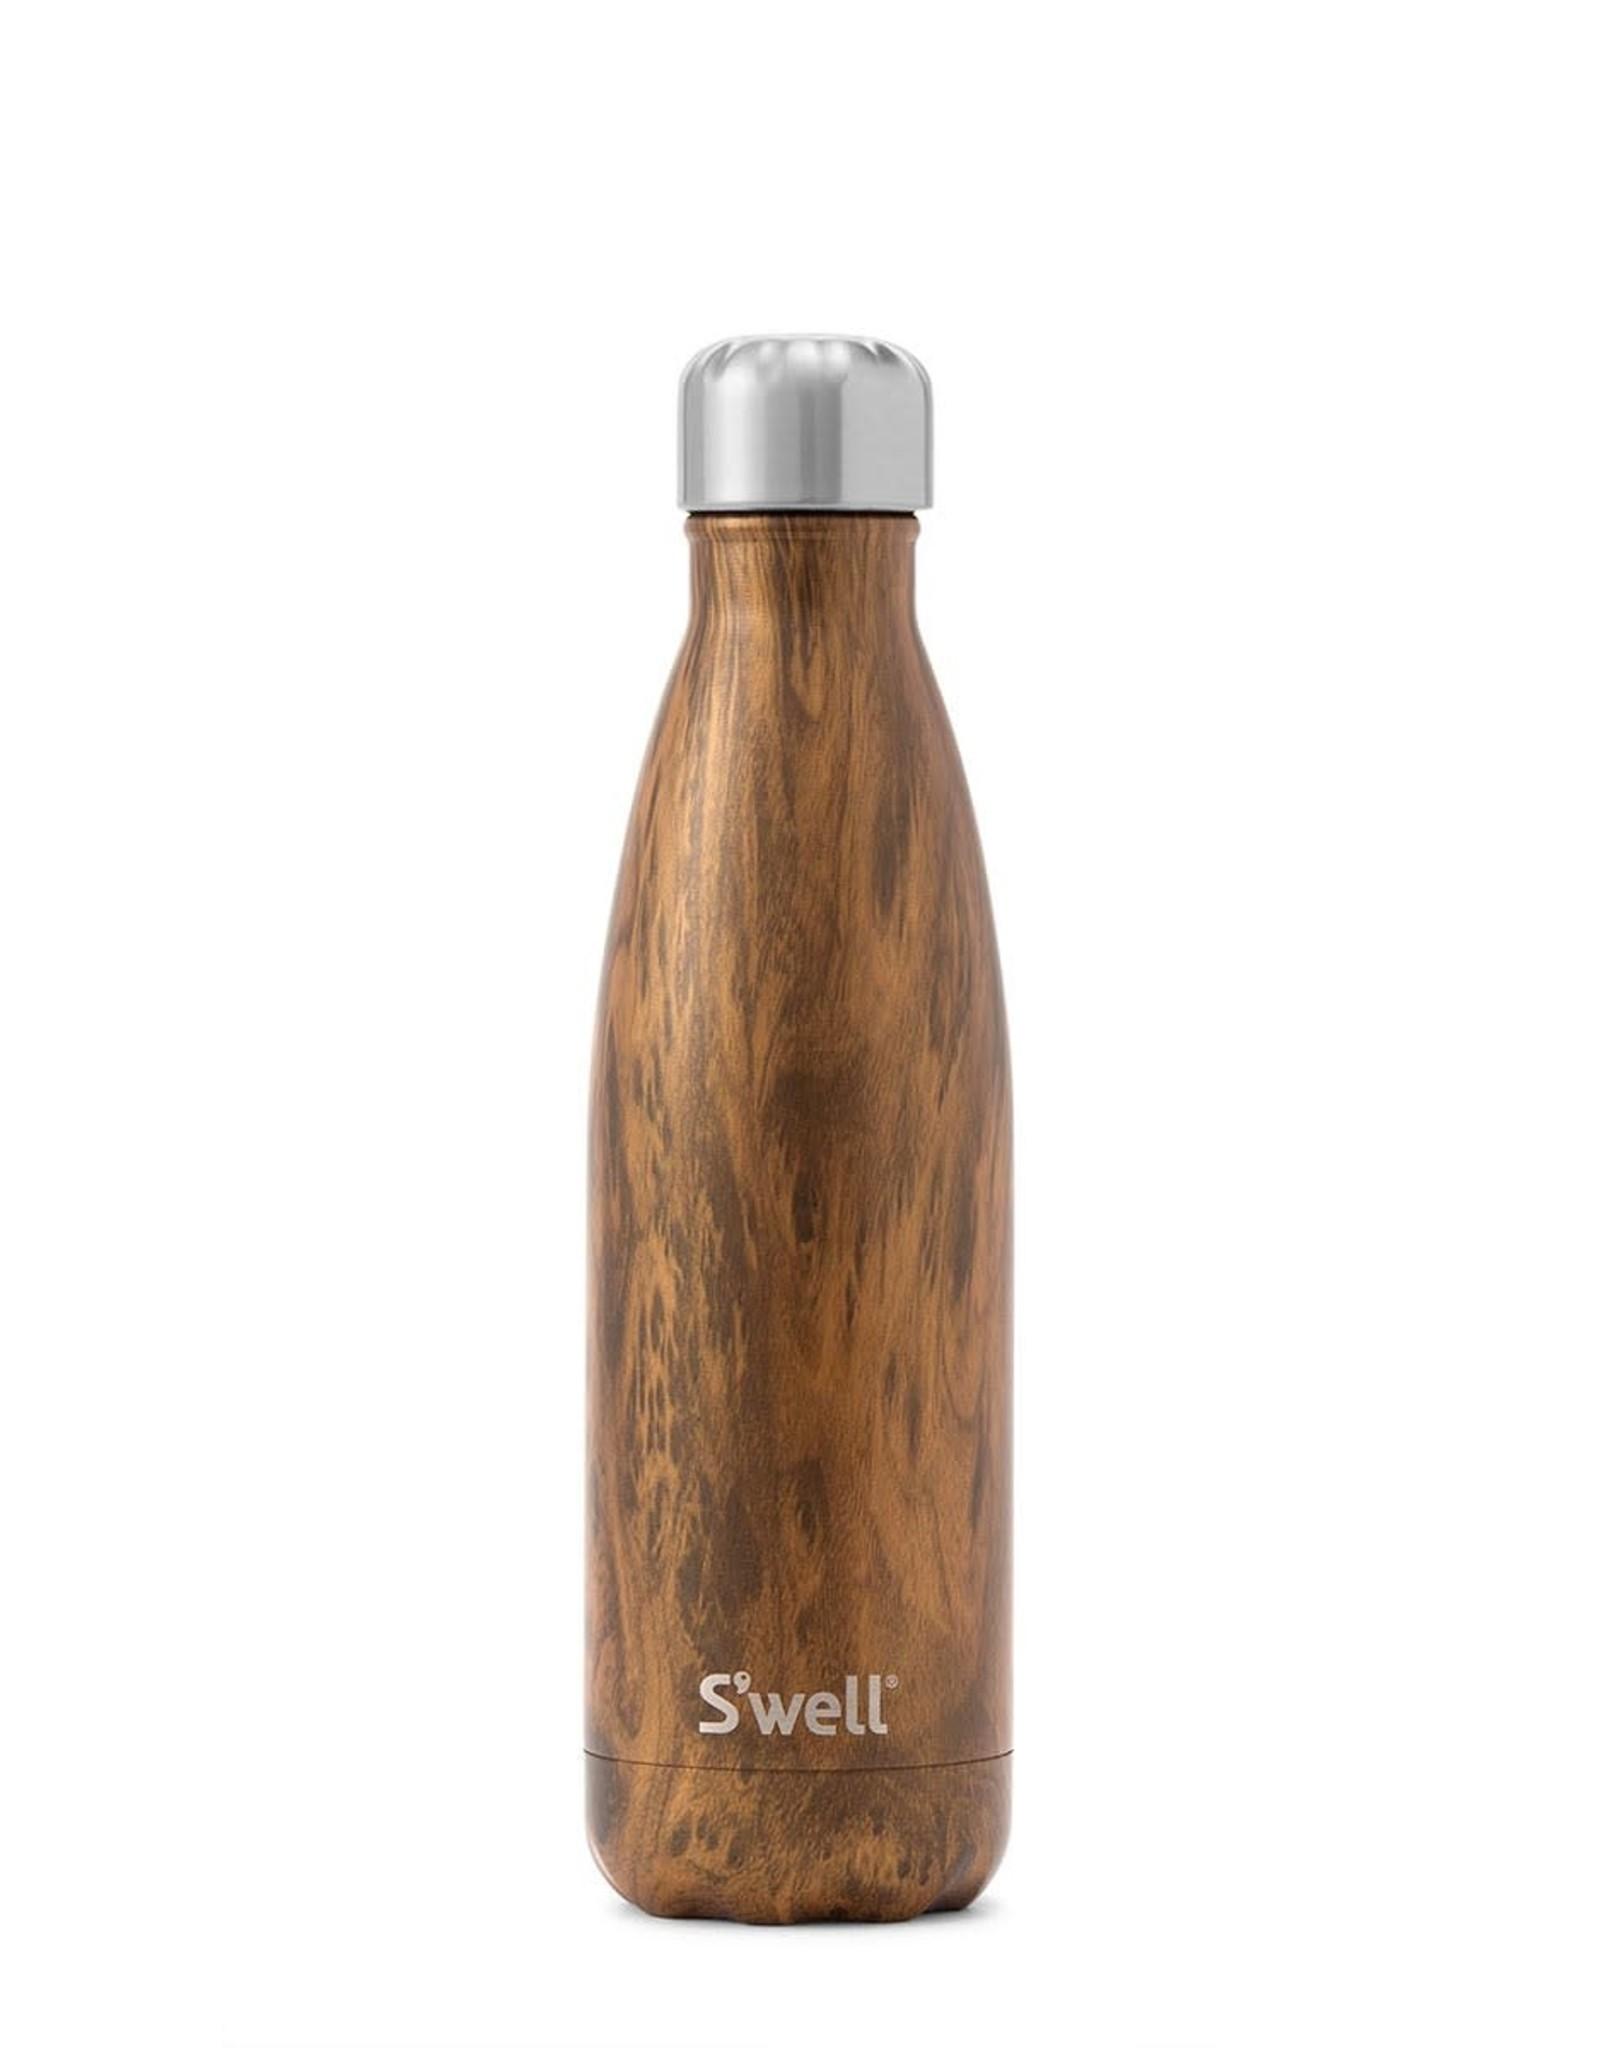 SWELL SWELL Bottle Teak 25 oz.